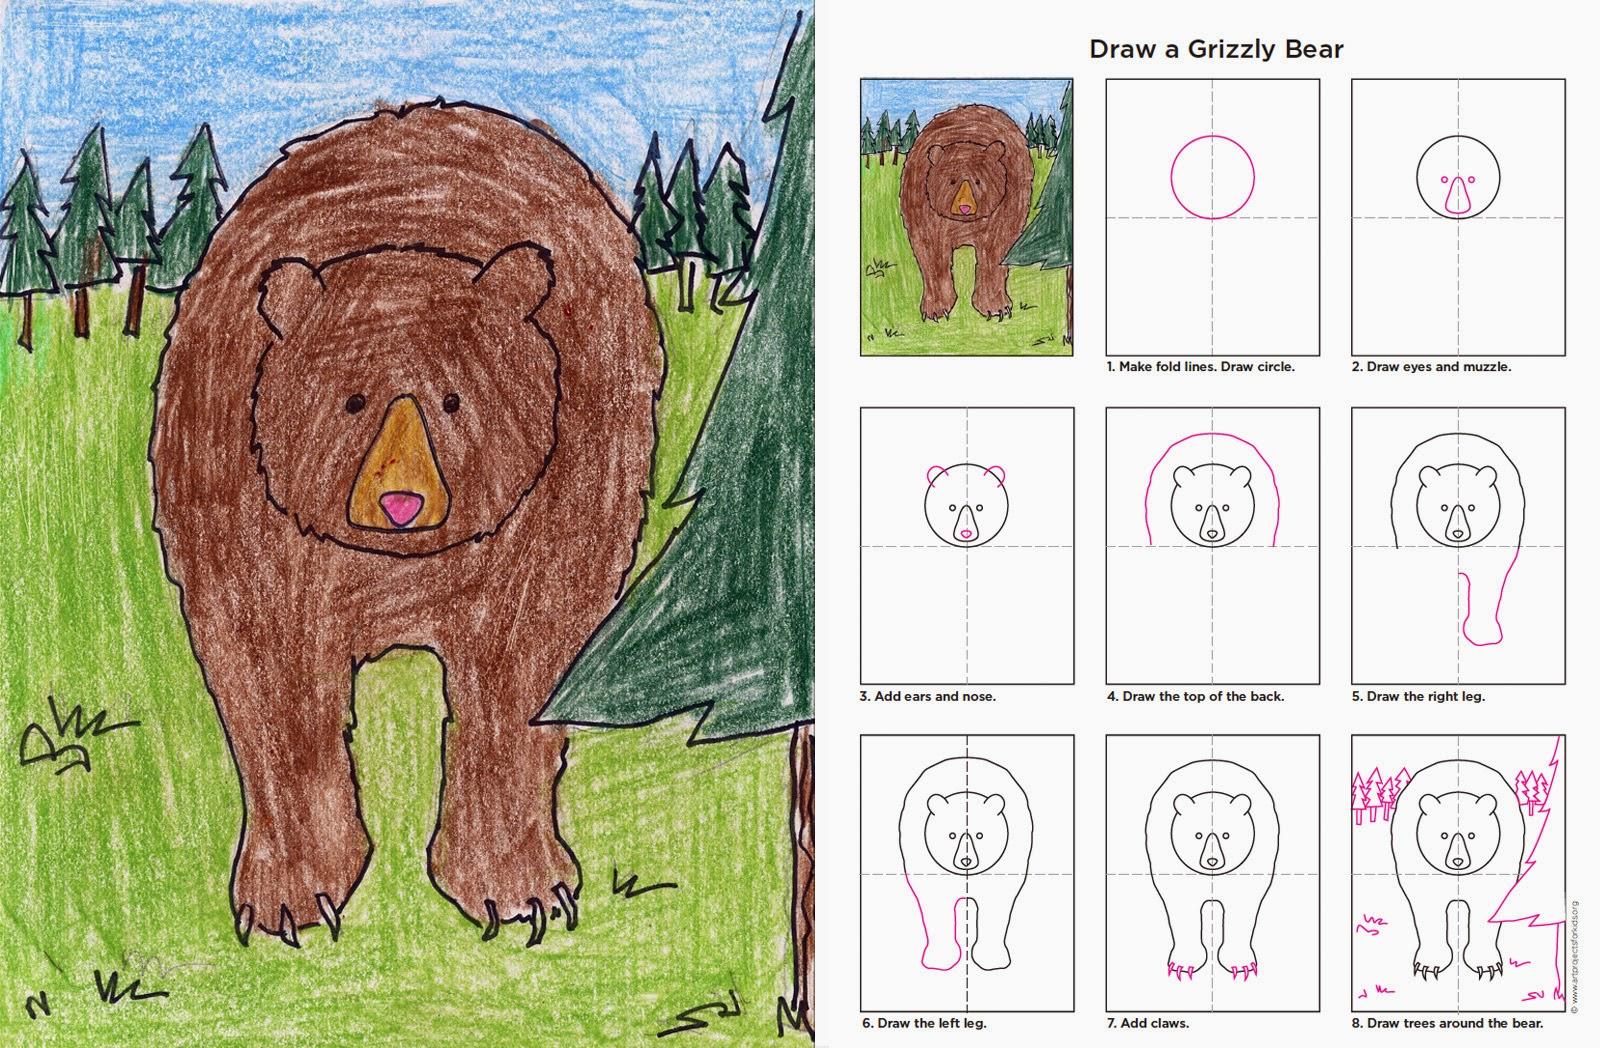 http://1.bp.blogspot.com/-t2YFry4_JBU/U2nOVg0hBsI/AAAAAAAATcU/5MoWYf1b7NM/s1600/Grizzly+Bear+diagrams.jpg